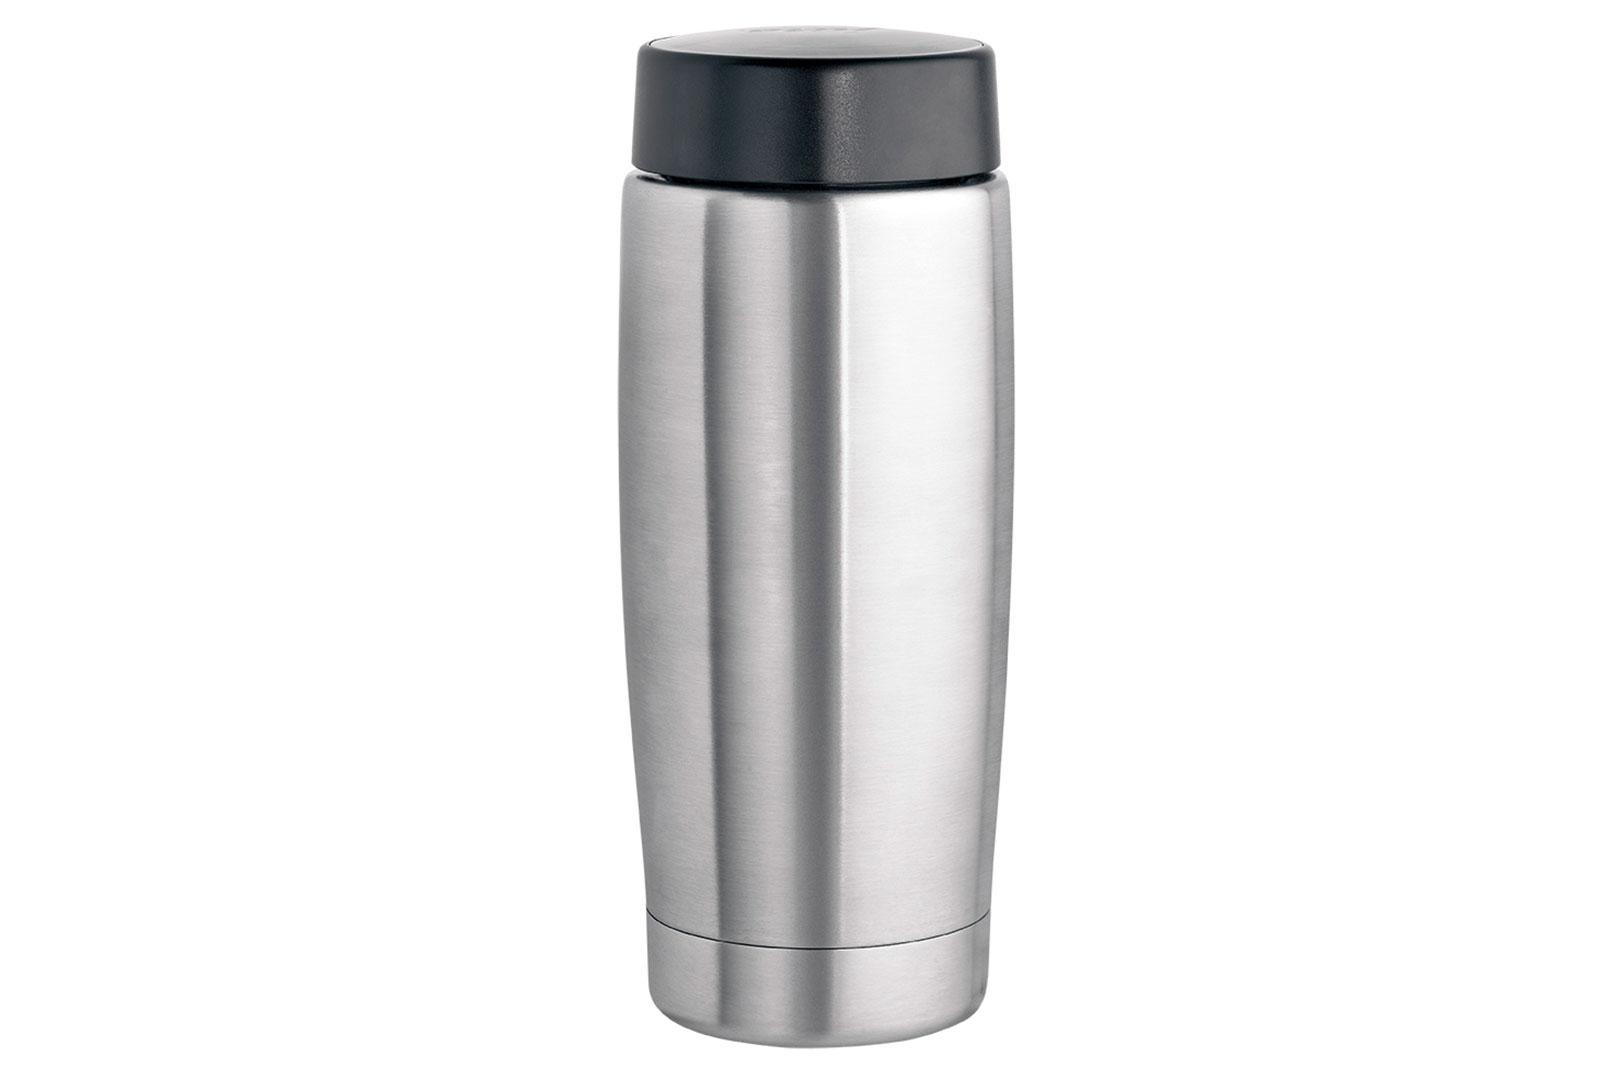 Jura Edelstahl-Isoliermilchbehälter 0,6 Liter